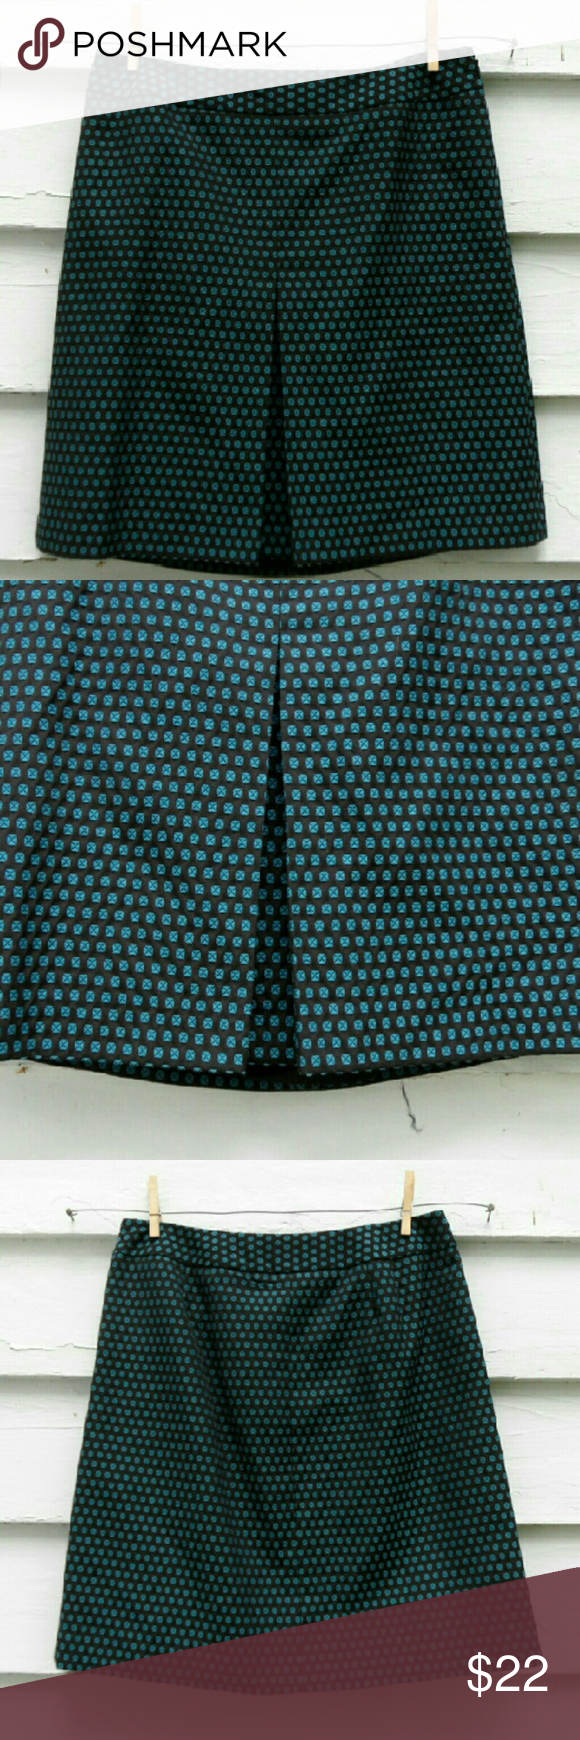 Ann Taylor LOFT skirt Black & blue Ann Taylor LOFT skirt. Perfect to wear to work or a business event. In mint condition! Make an offer LOFT Skirts